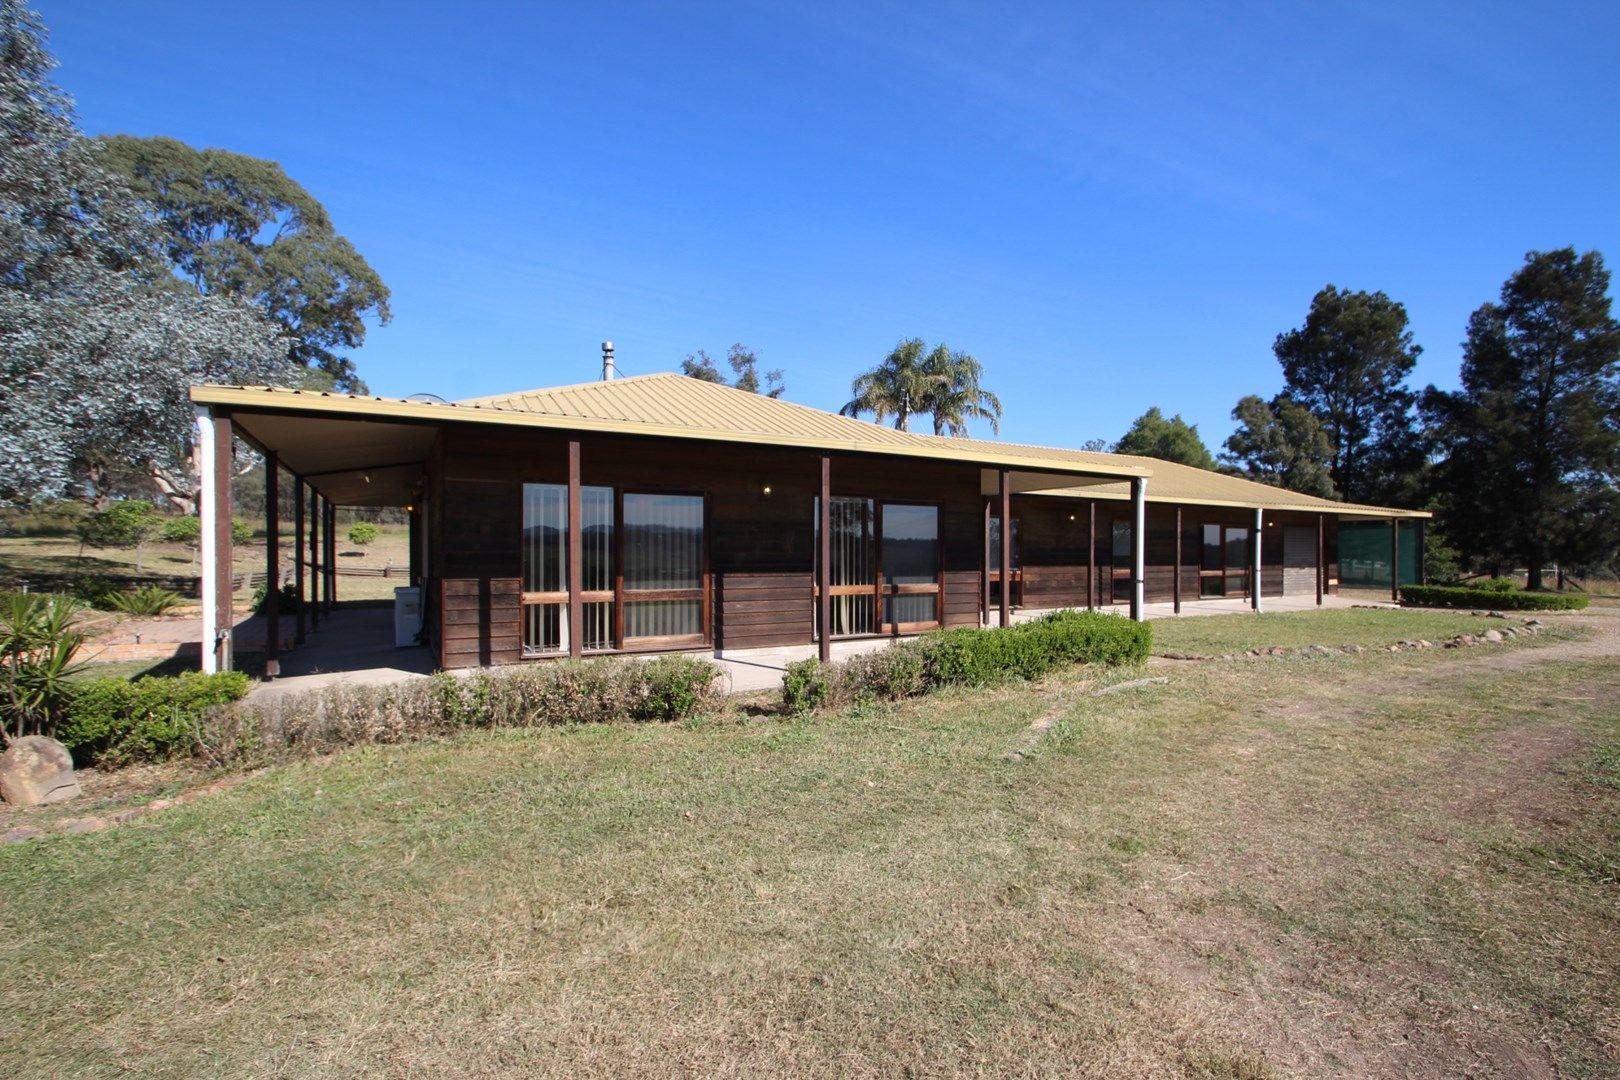 MIDDLE FALBROOK ROAD, Singleton NSW 2330, Image 0